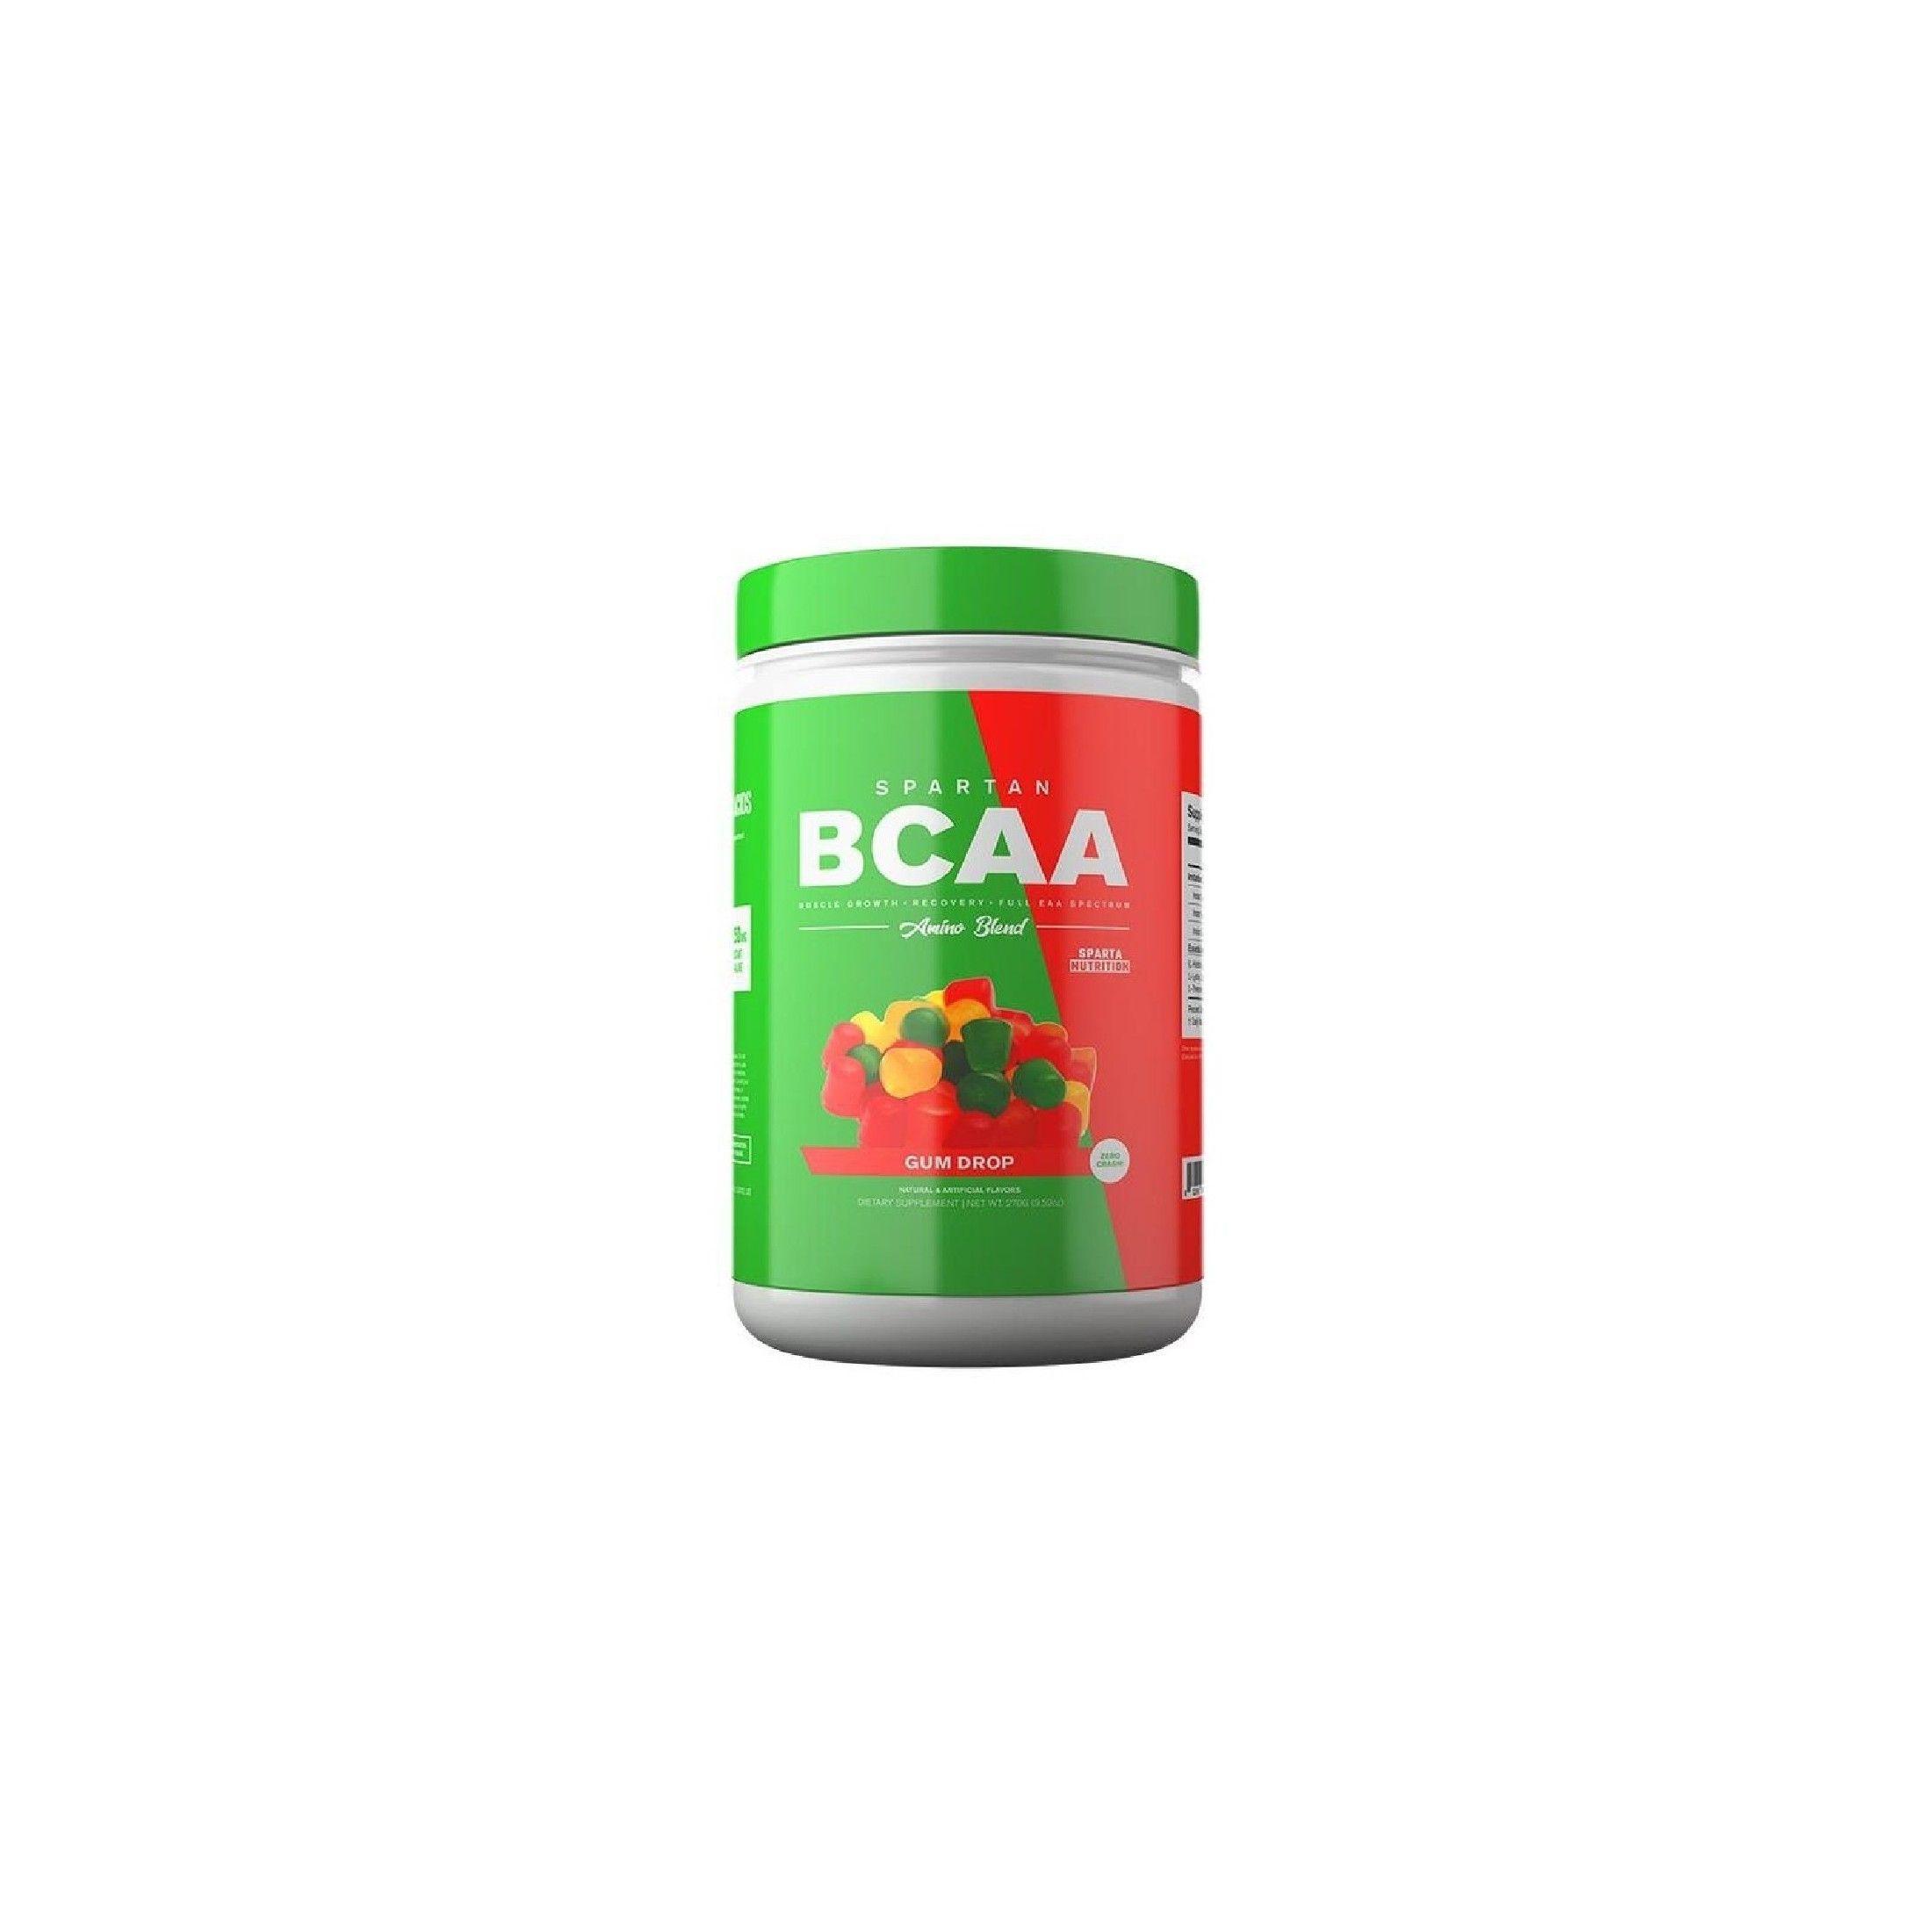 Iron Horse Red Adrenaline Energy 60 kaps.